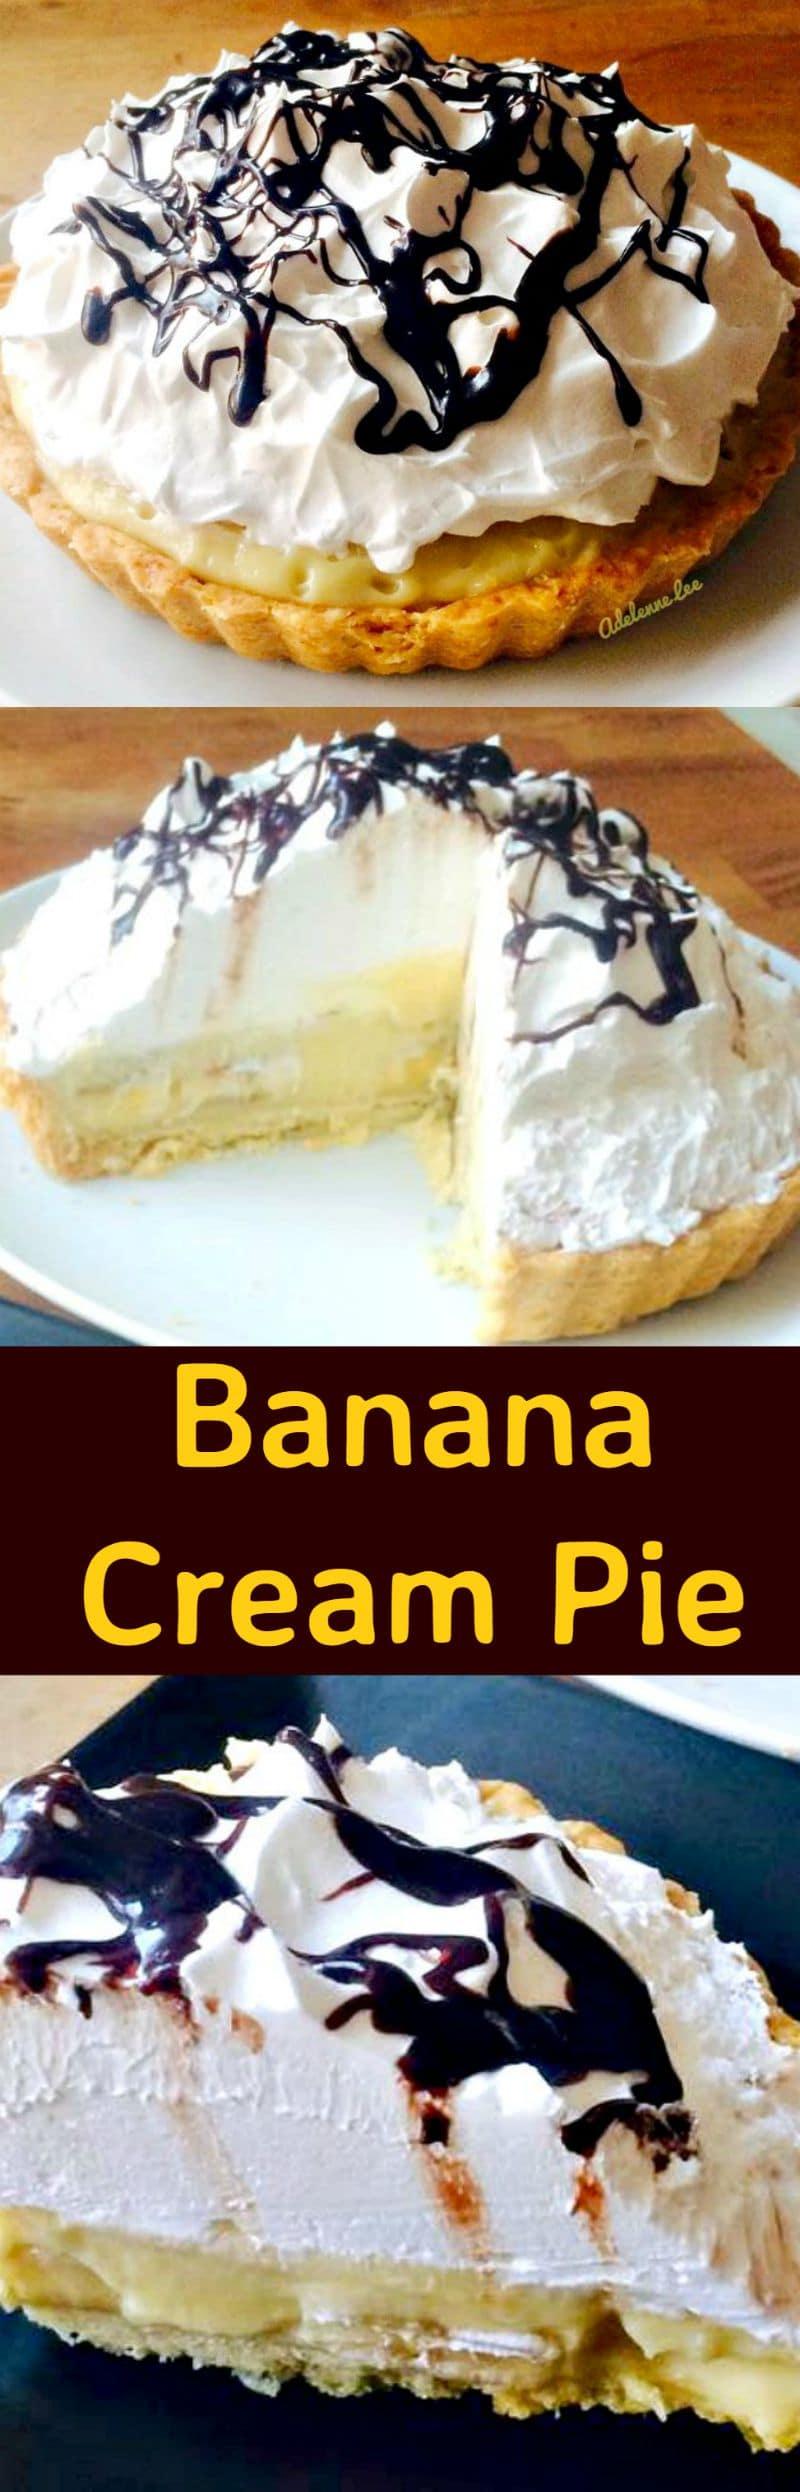 Banana Cream Pie - Easy and very delicious!